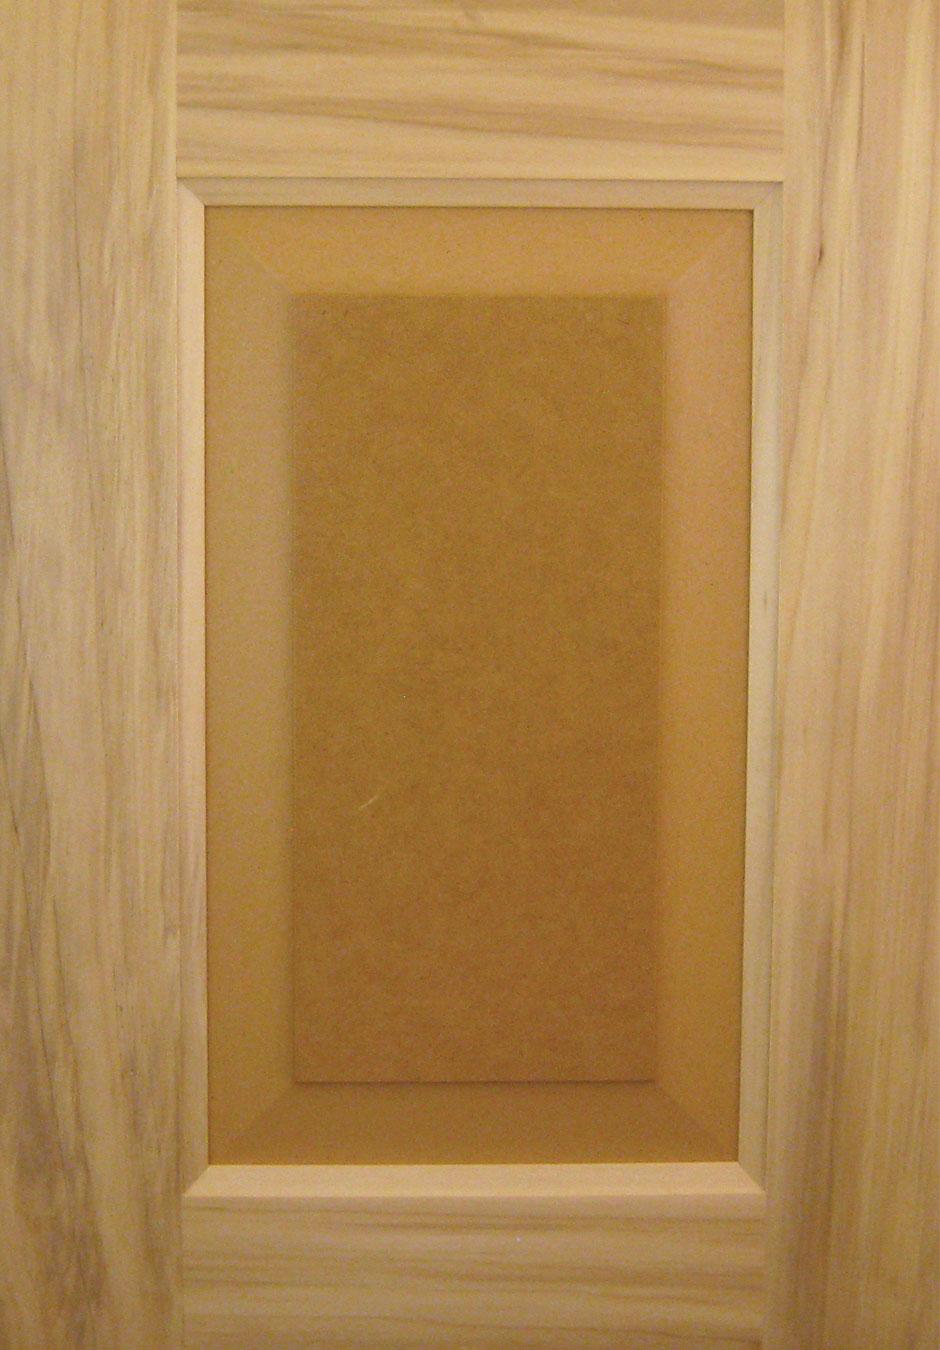 Paint Grade Poplar Frame with MDF Panel